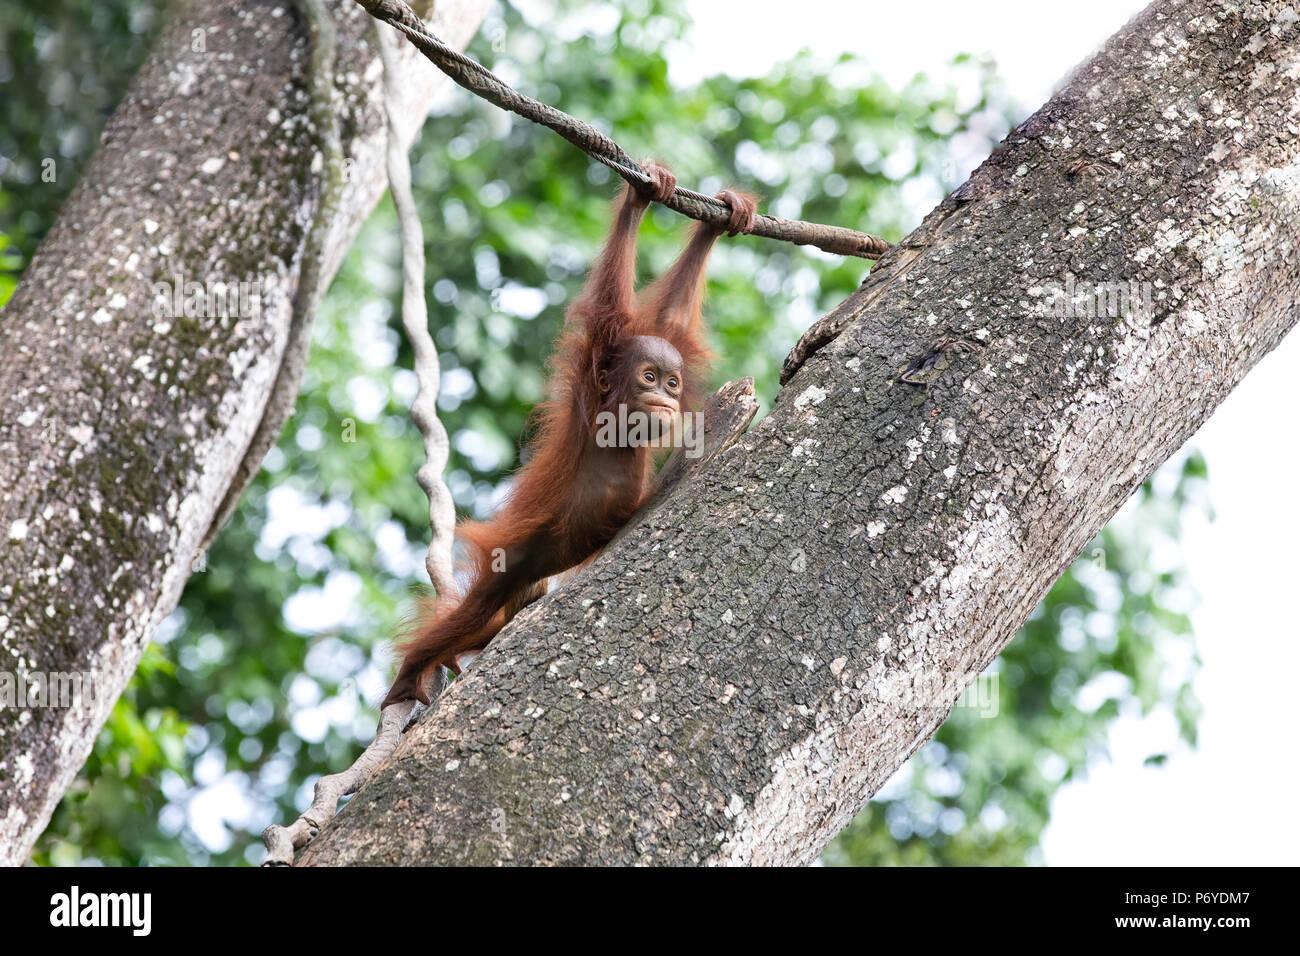 Portrait of a cute baby orangutan having fun in the greenery of a rainforest. Singapore. Stock Photo